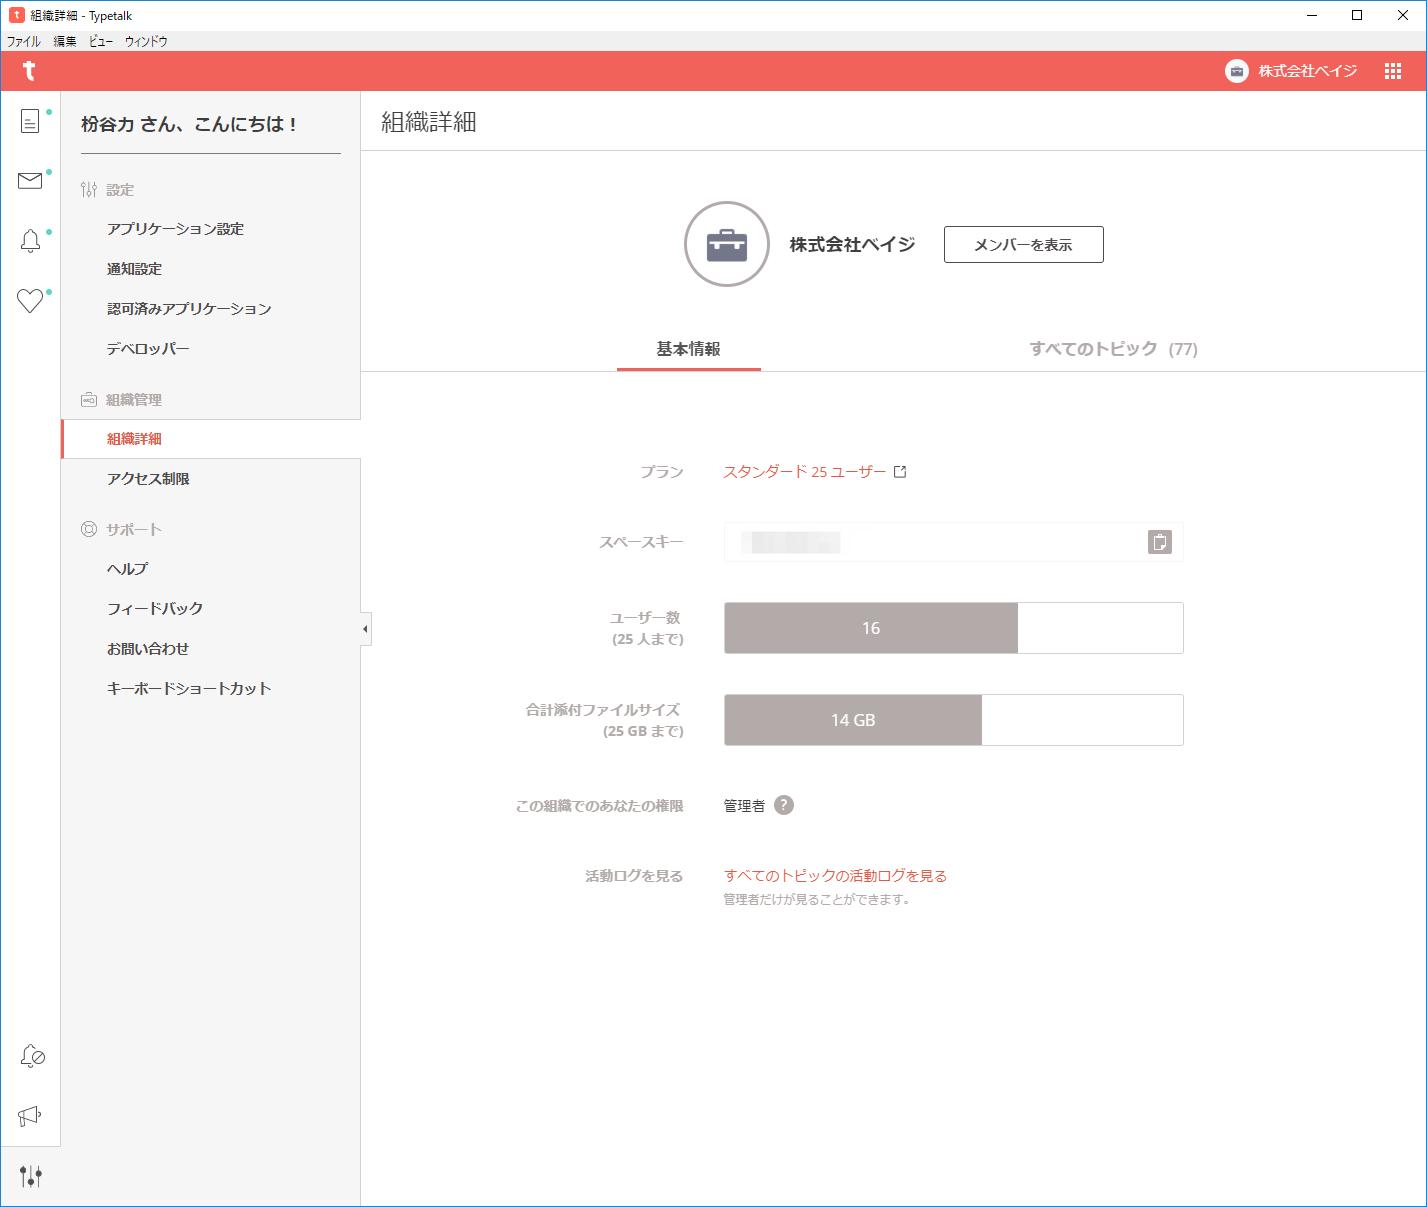 Typetalkの管理画面イメージ